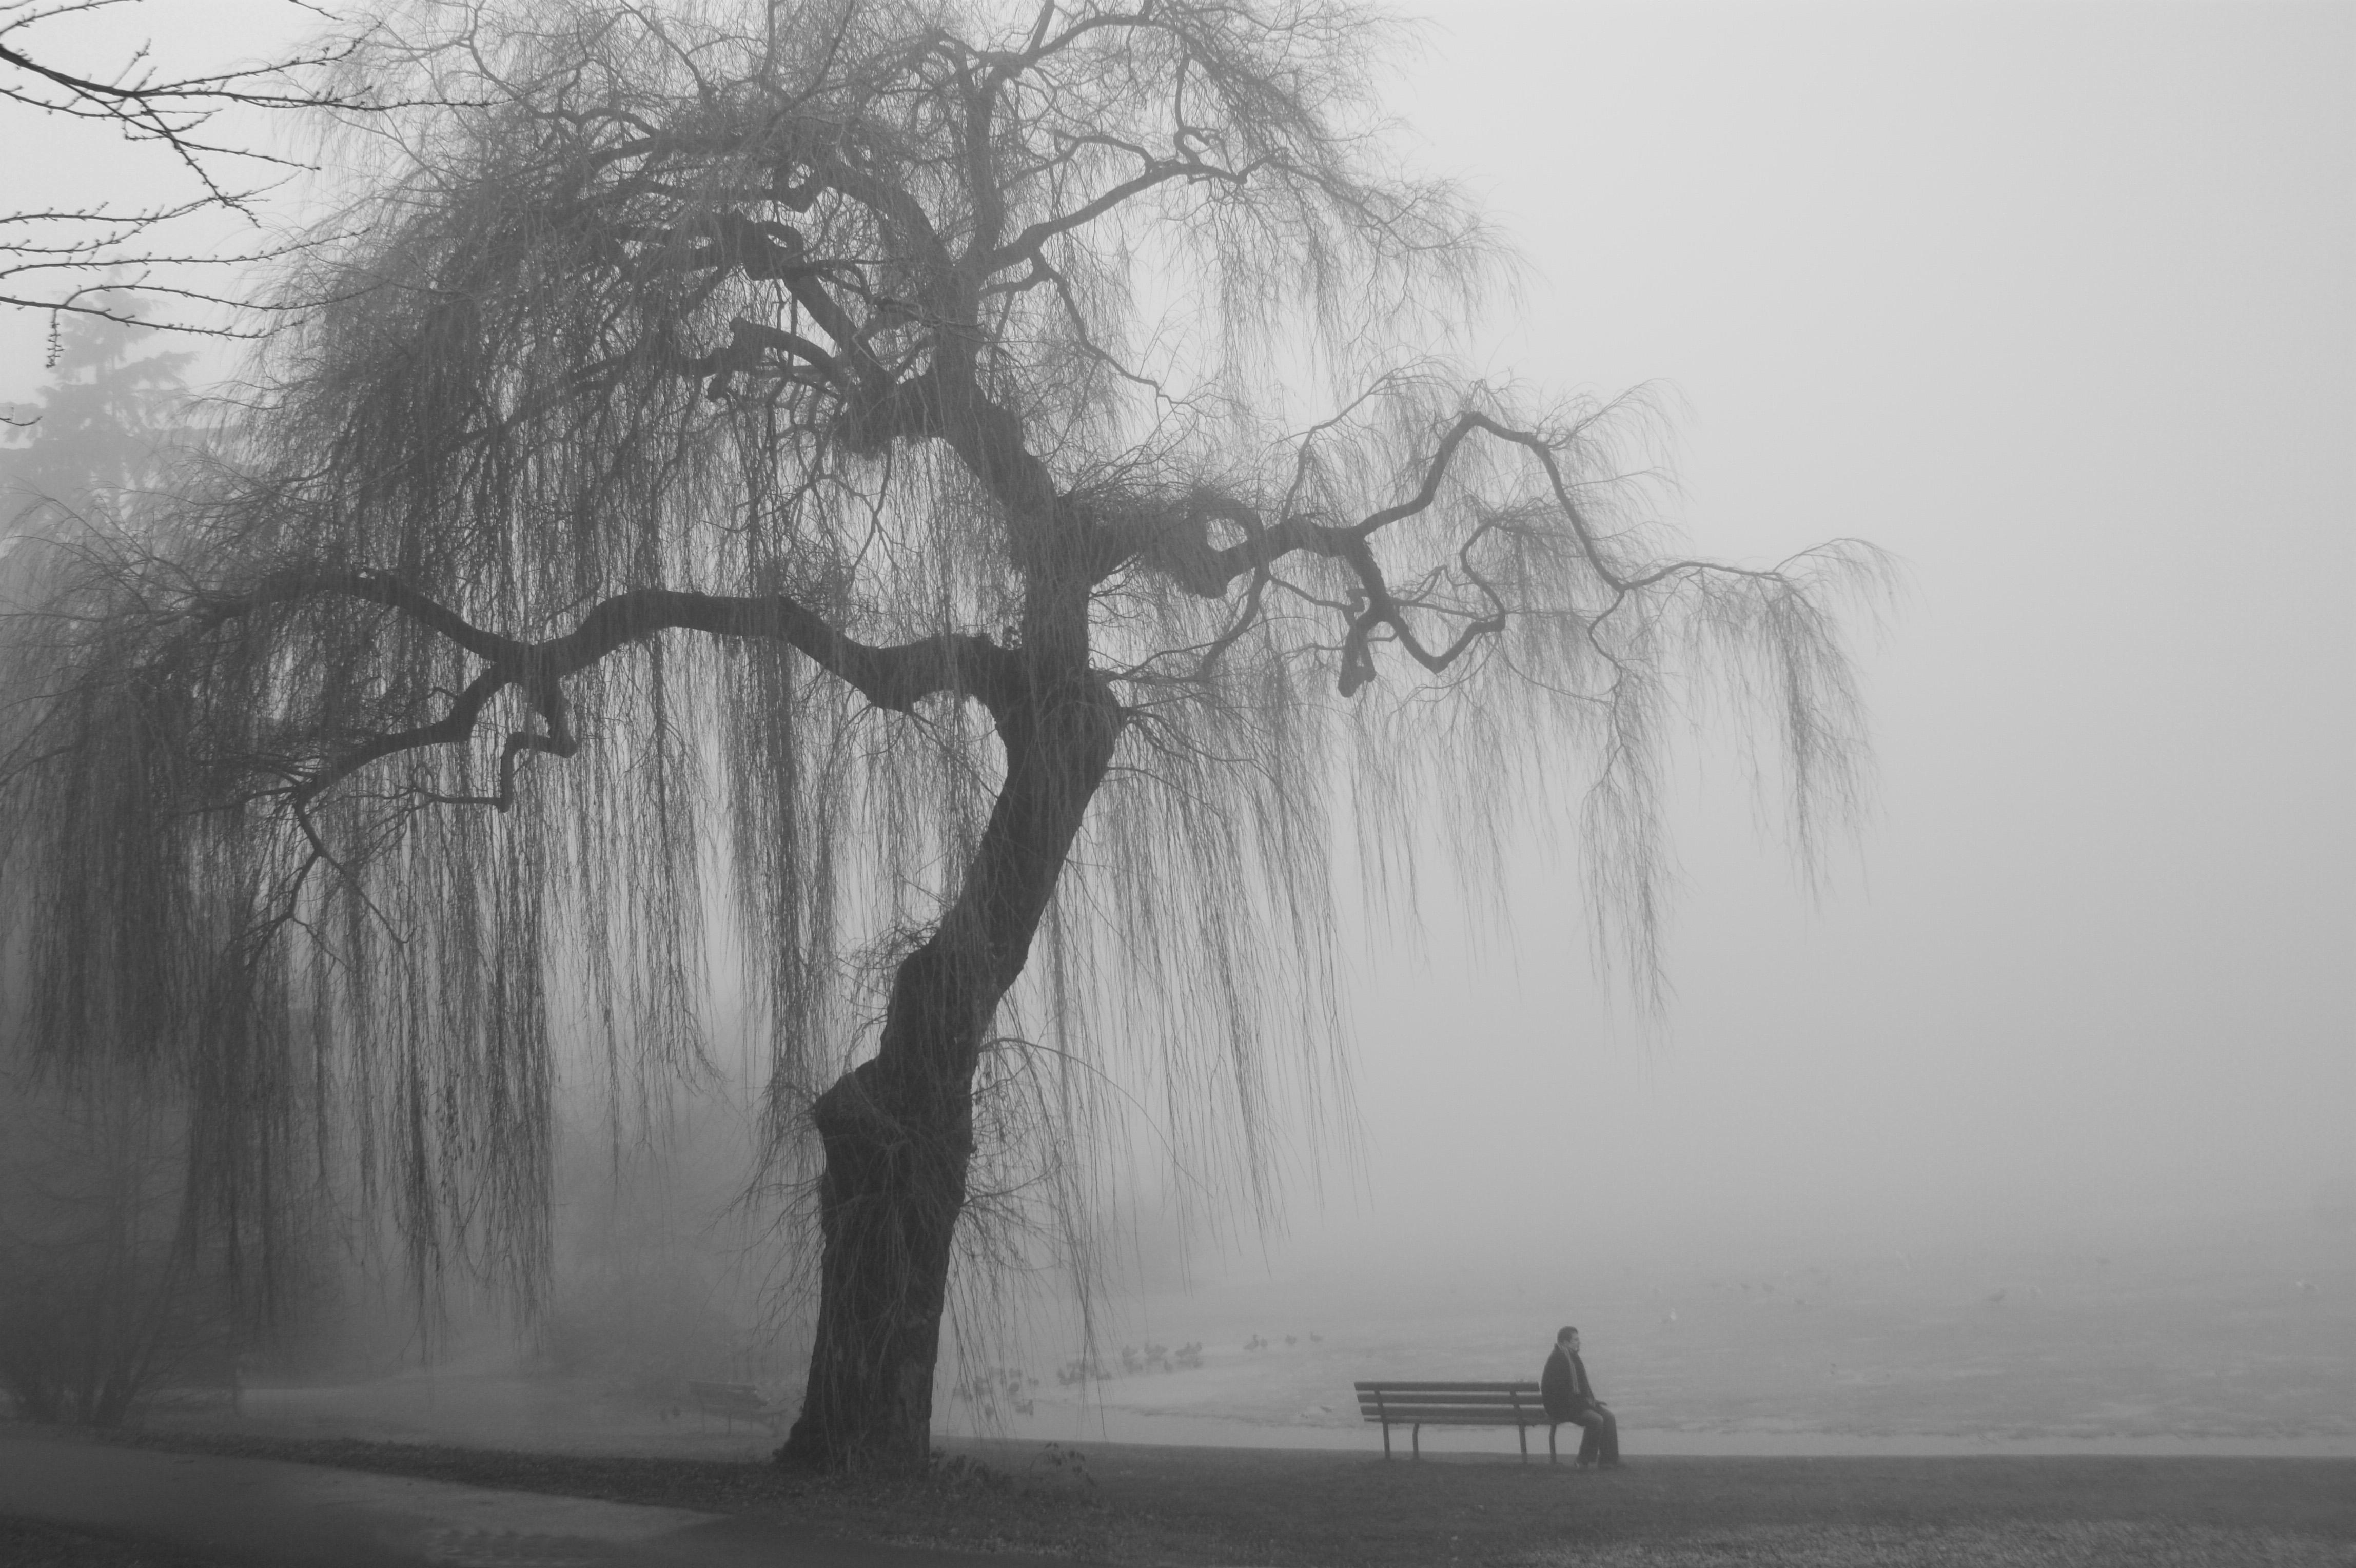 man-bench-willow